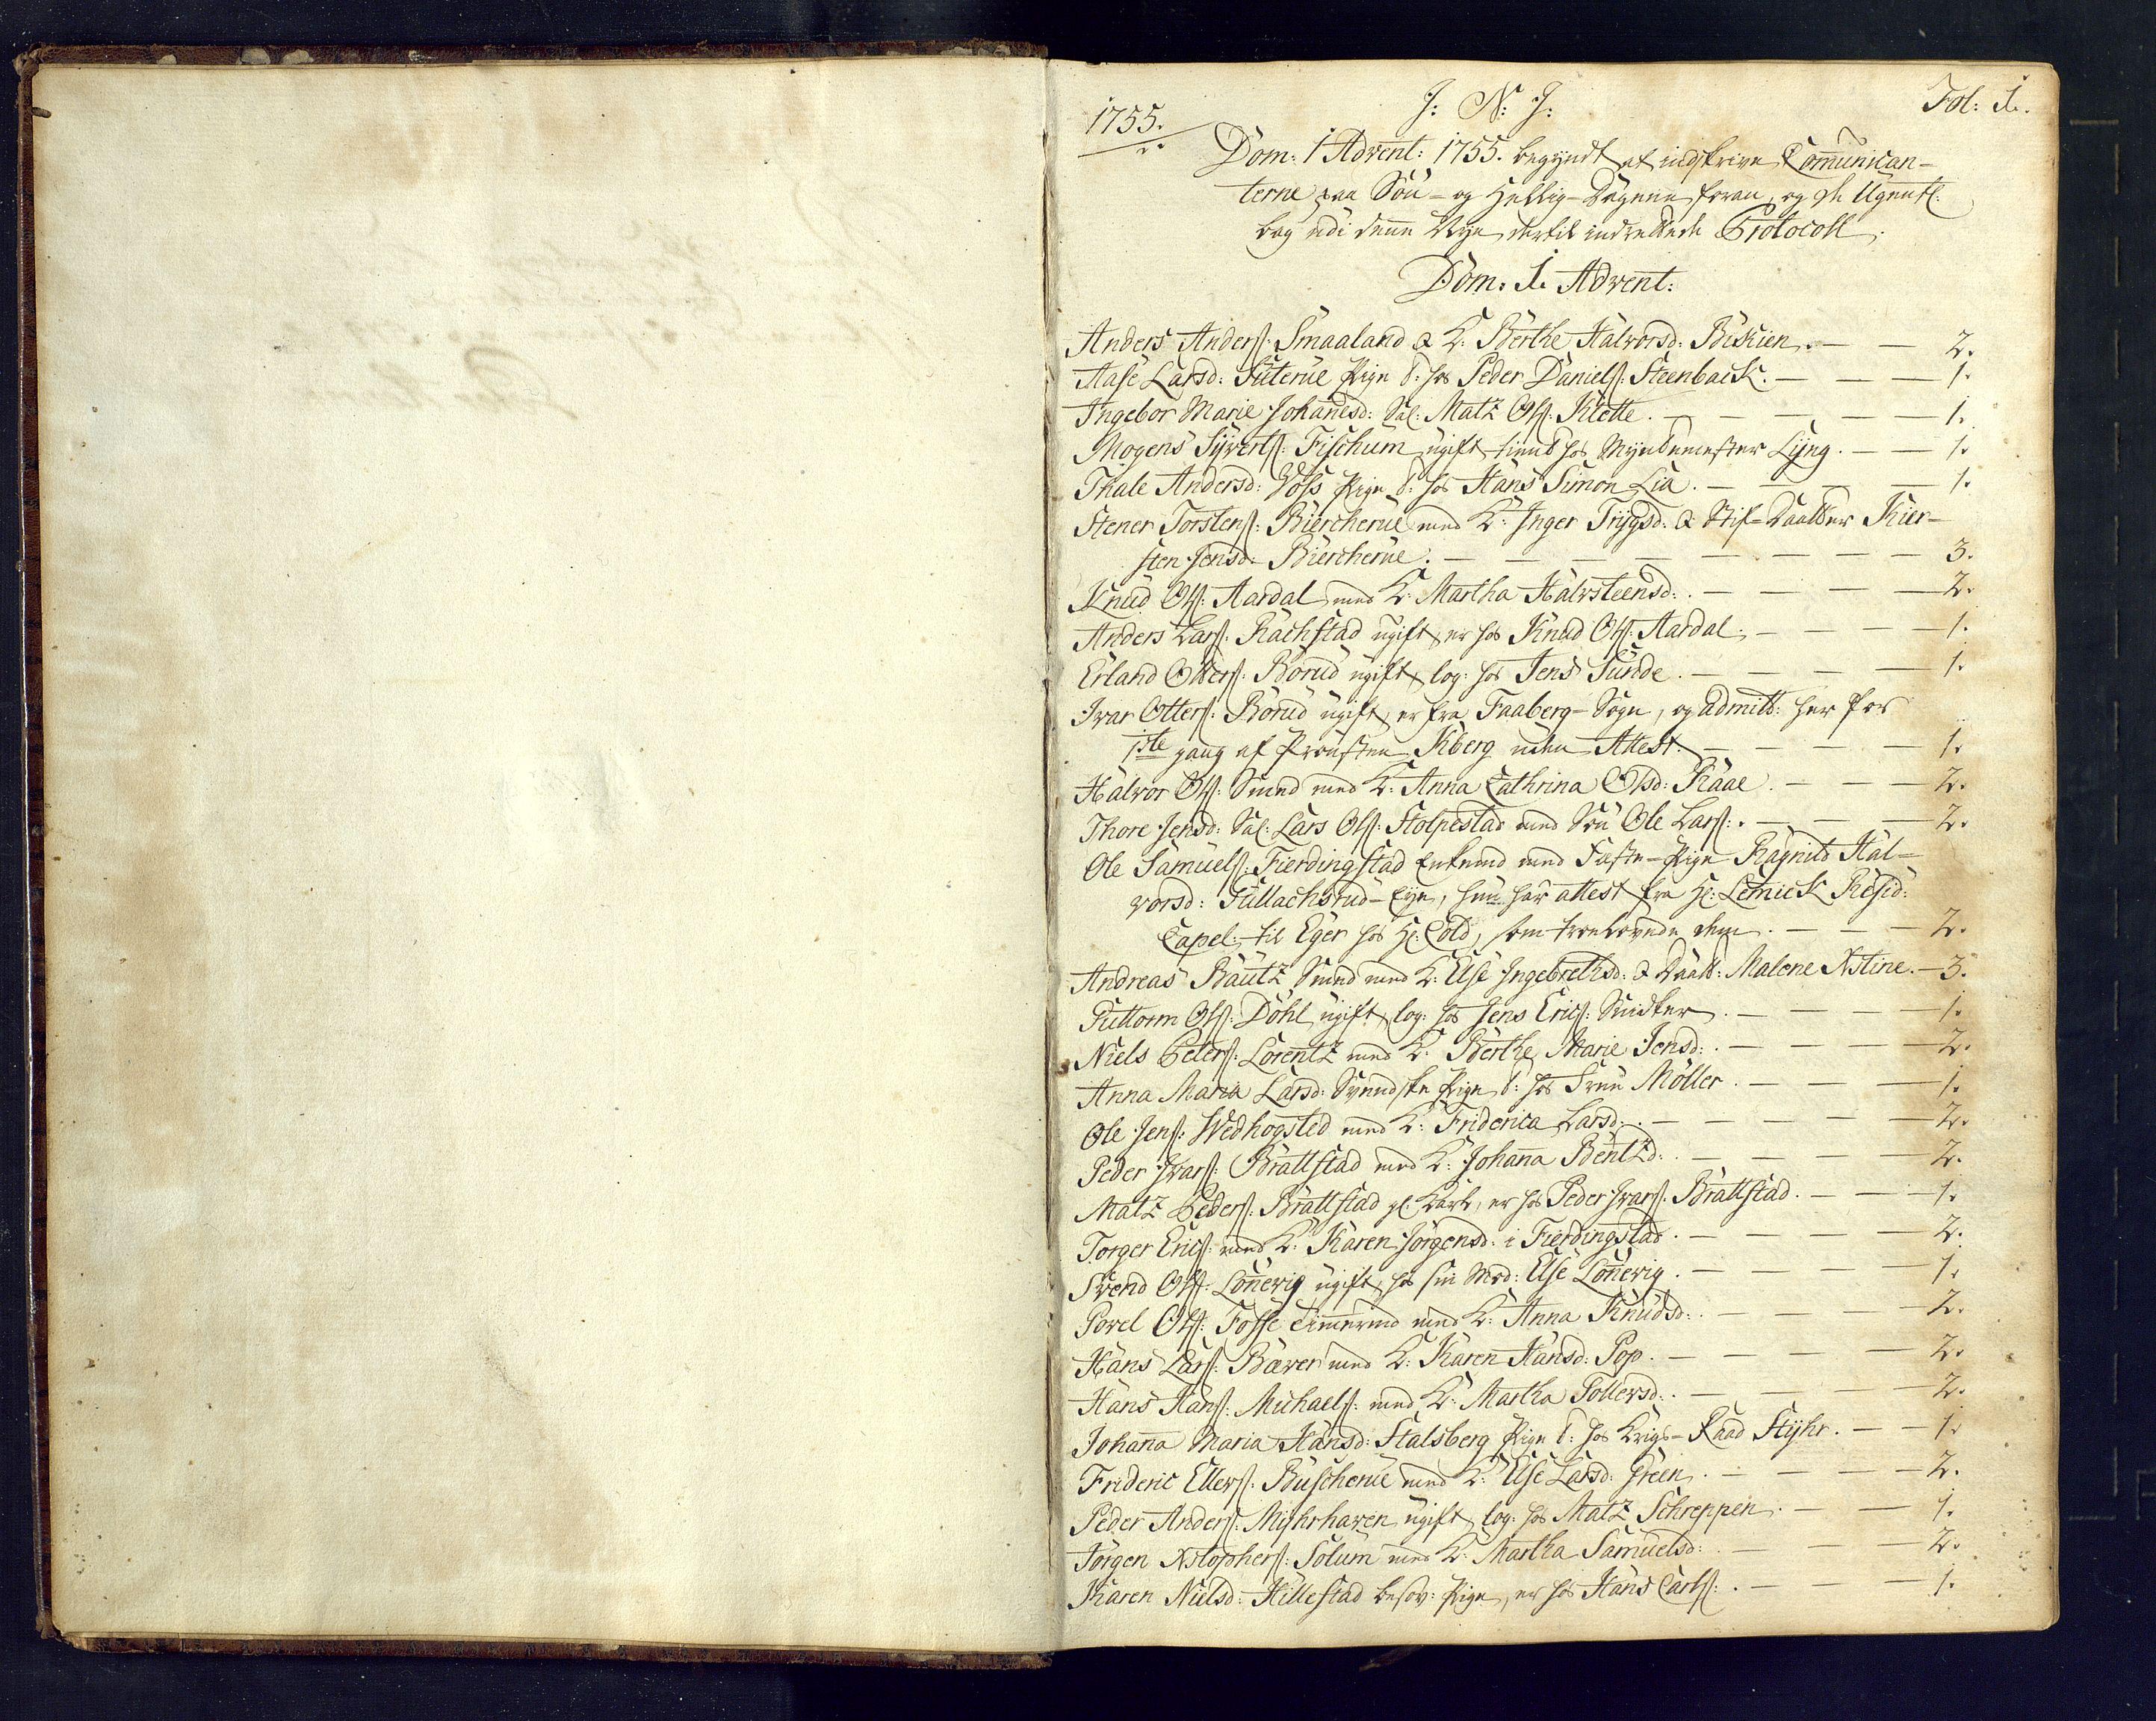 SAKO, Kongsberg kirkebøker, M/Ma/L0005: Kommunikantprotokoll nr. 5, 1755-1761, s. 1